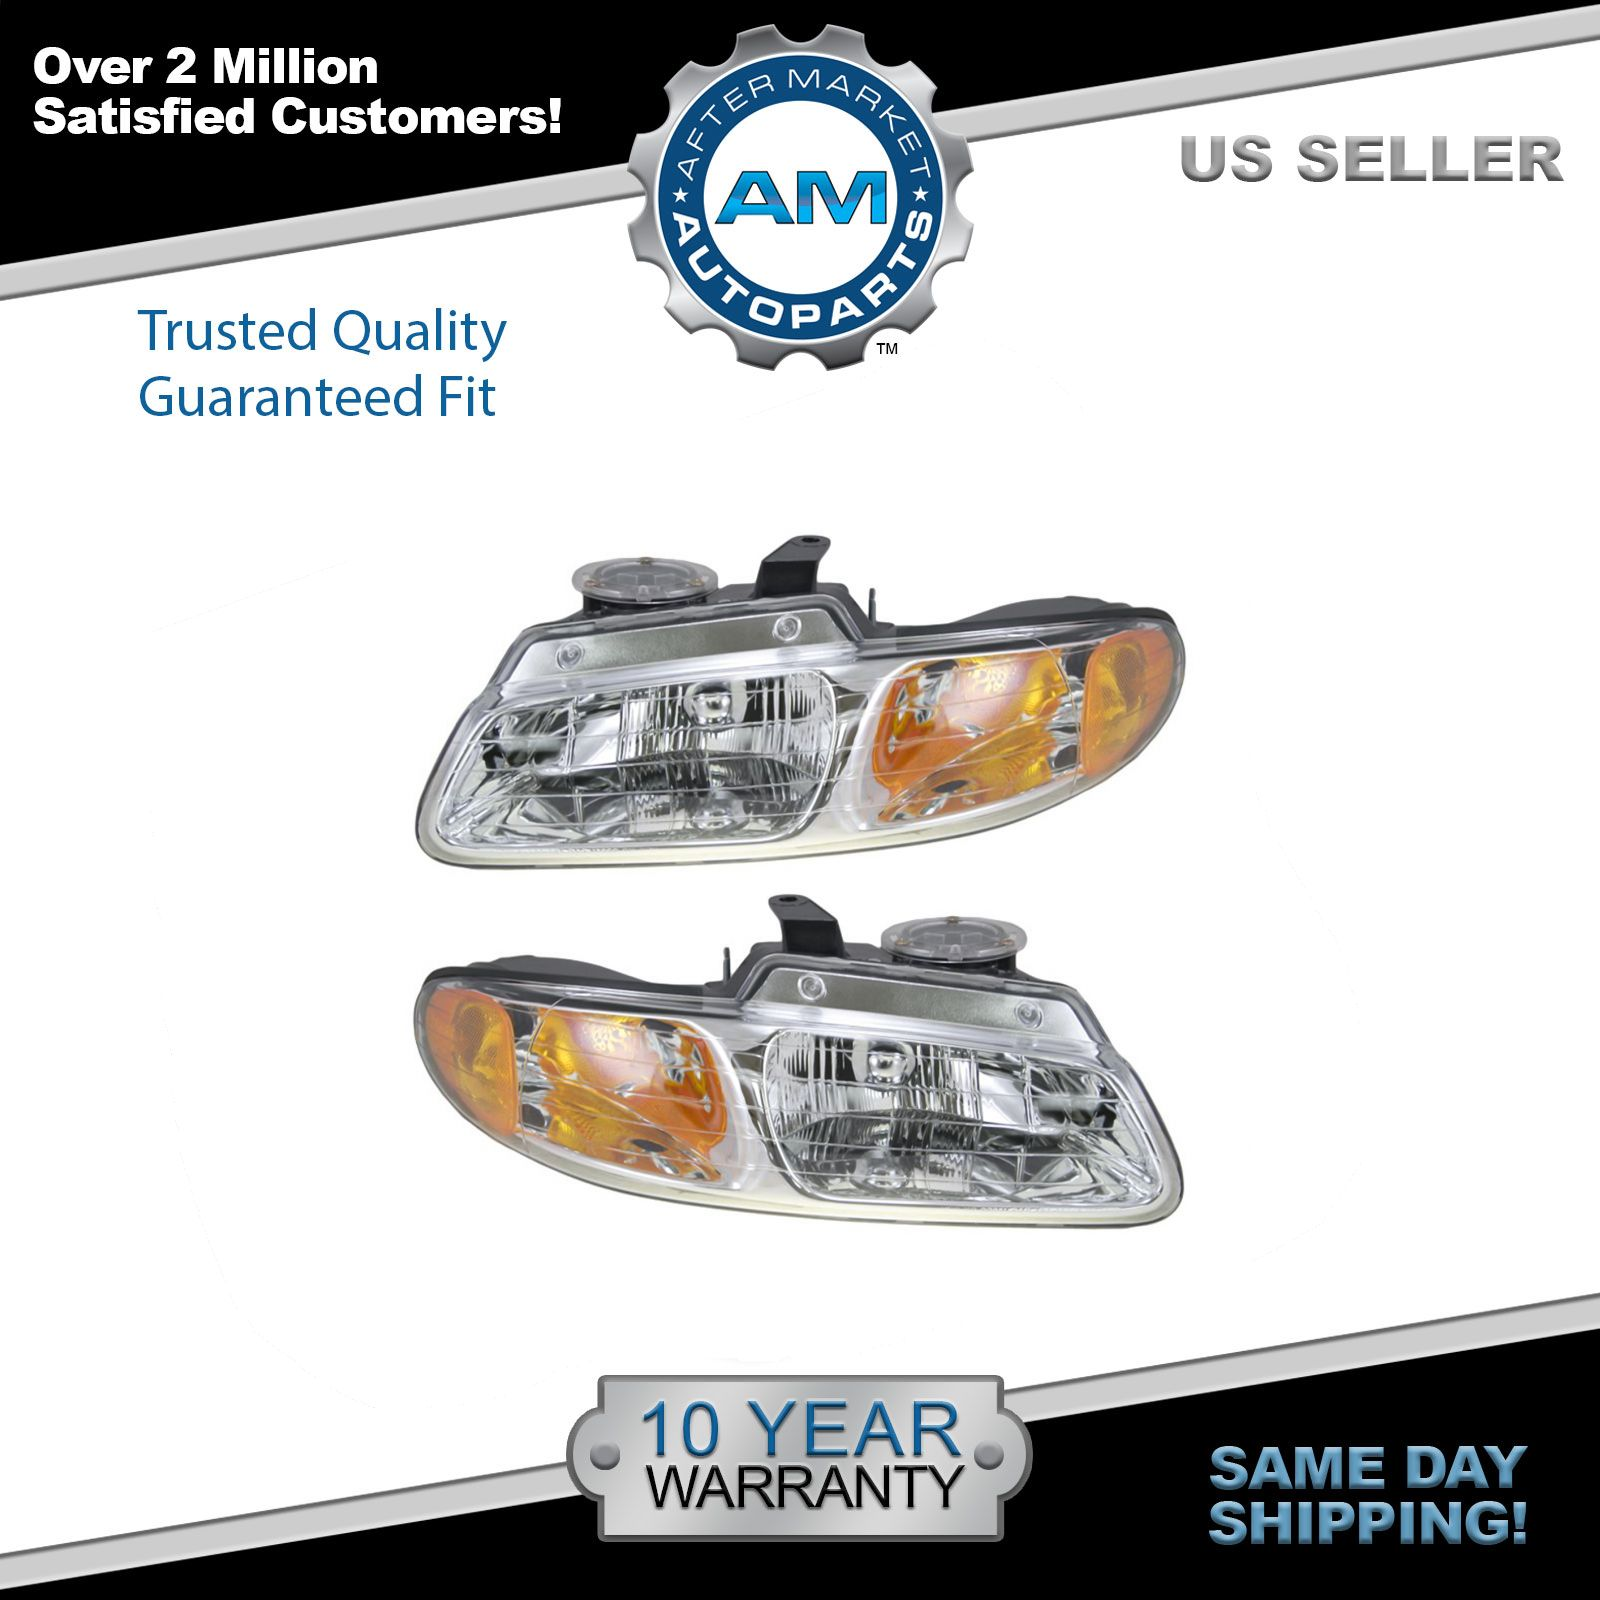 Headlights Headlamps Left Right Pair Set For 96 99 Dodge Grand Caravan Voyager